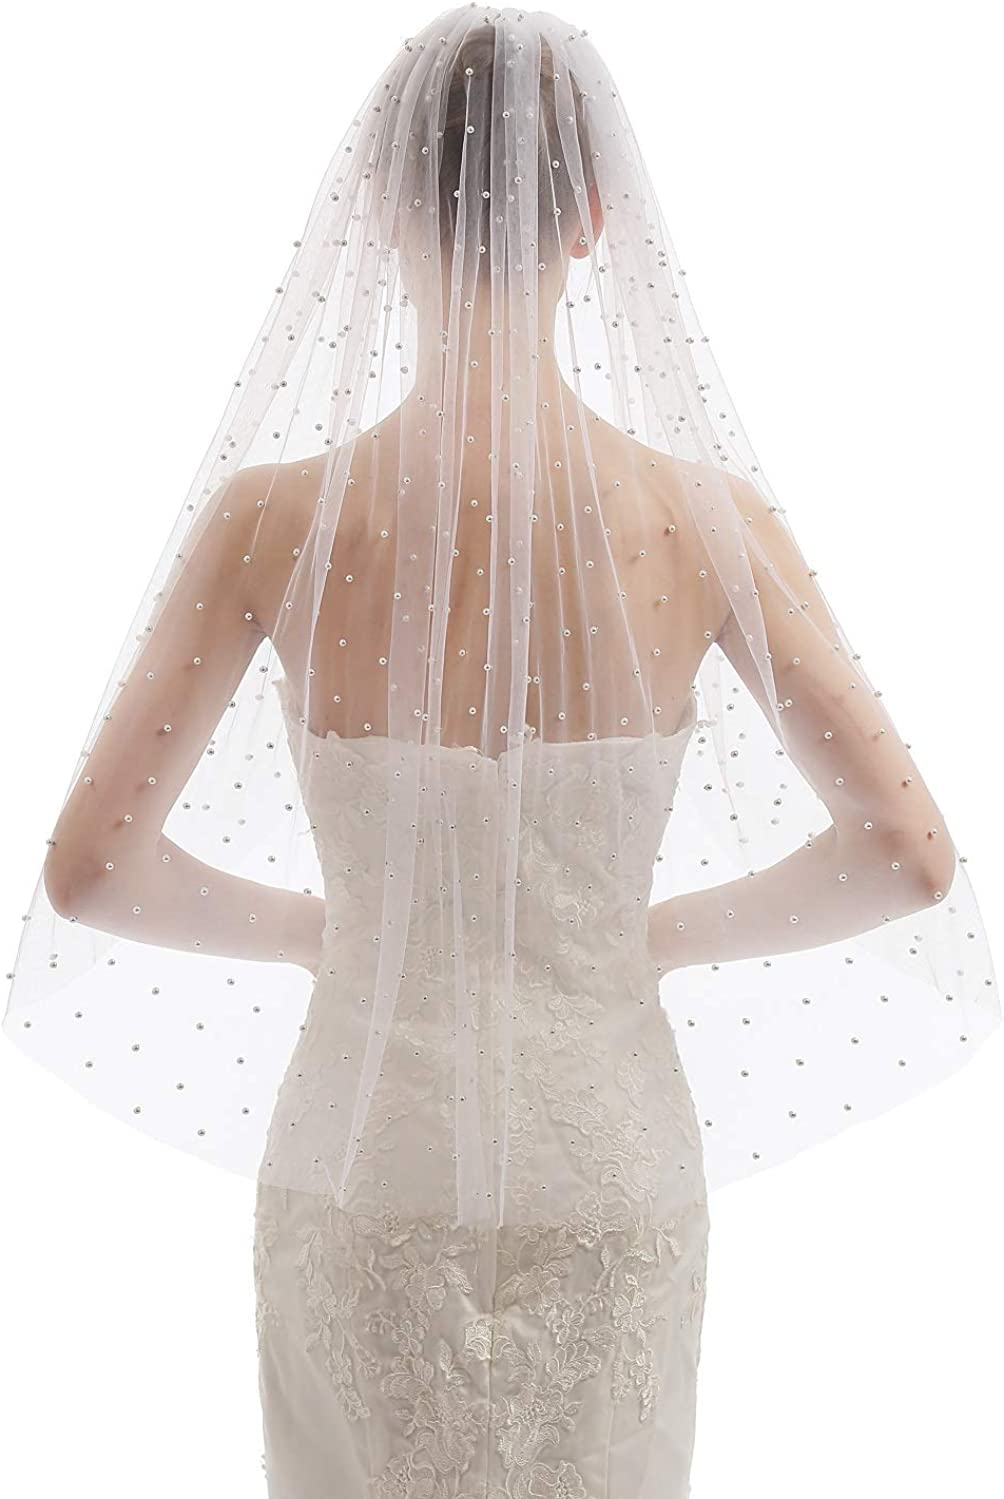 EllieHouse Womens Short Fingertip Length 1 Tier Pearl Wedding Bridal Veil With Metal Comb HD33